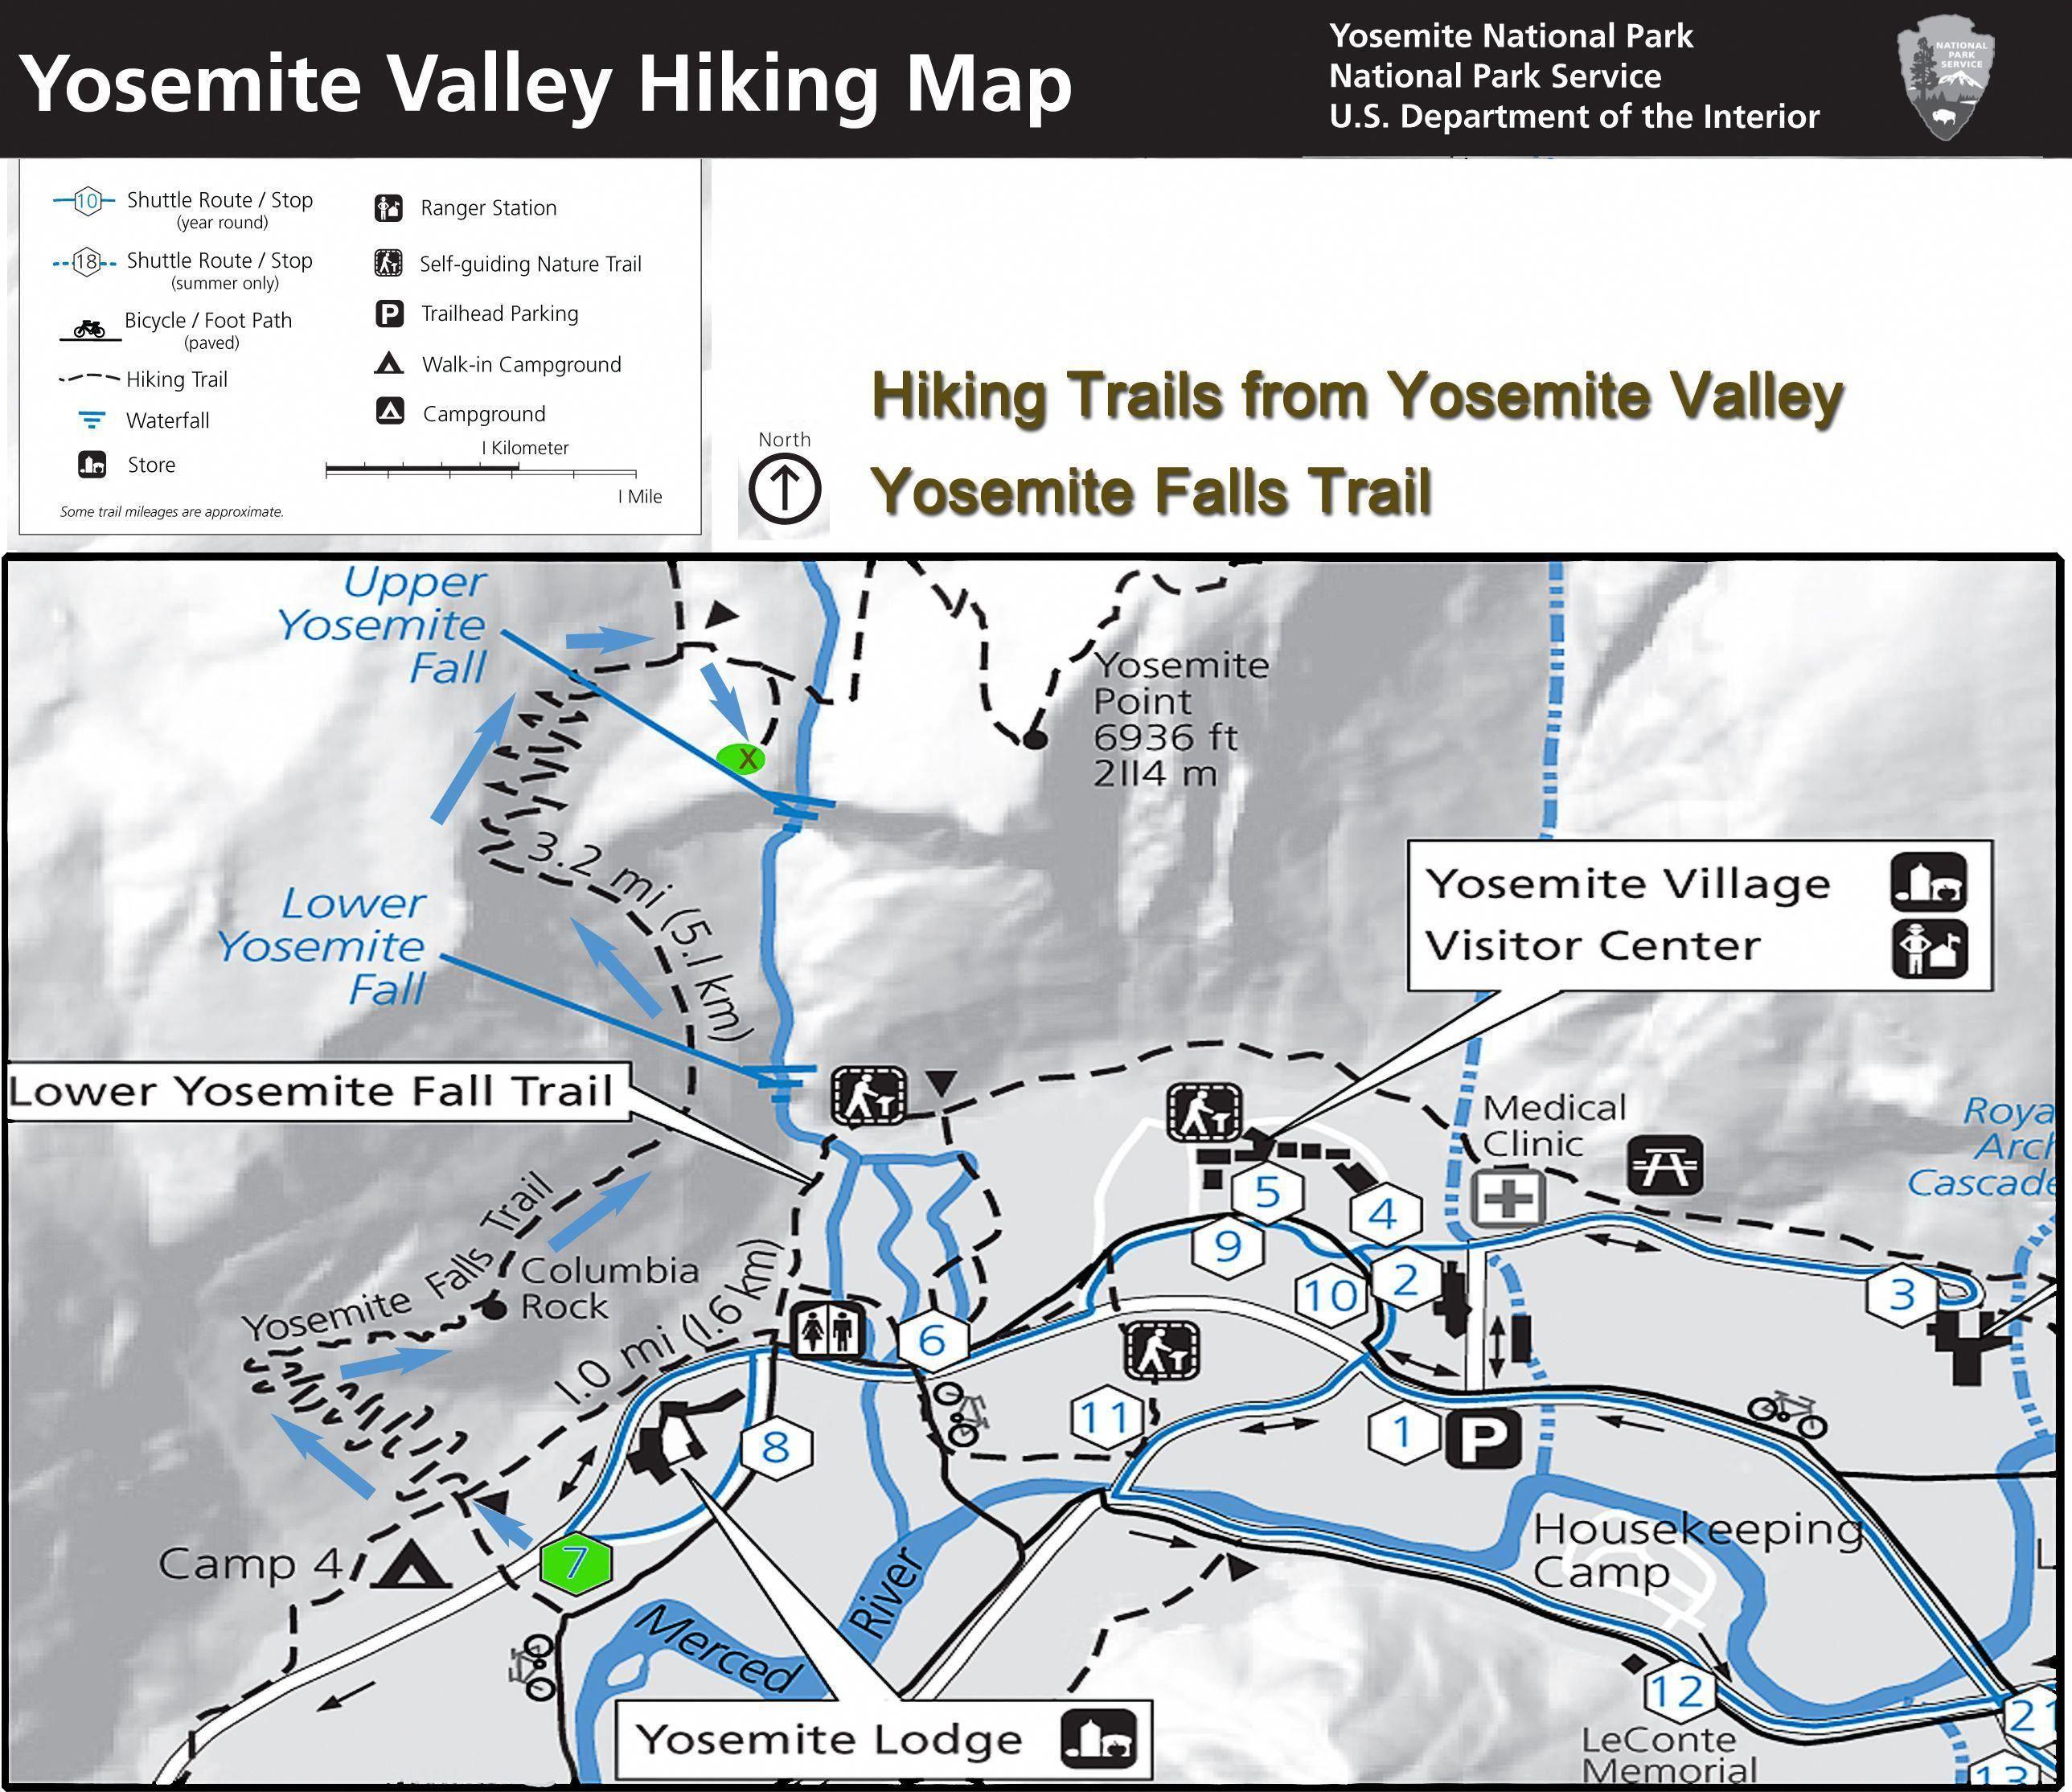 Yosemite Hiking Map Yosemite Falls Trail Yosemite Falls Is The Highest Measured Waterfall In North America L Hiking Map California Travel Yosemite Camping